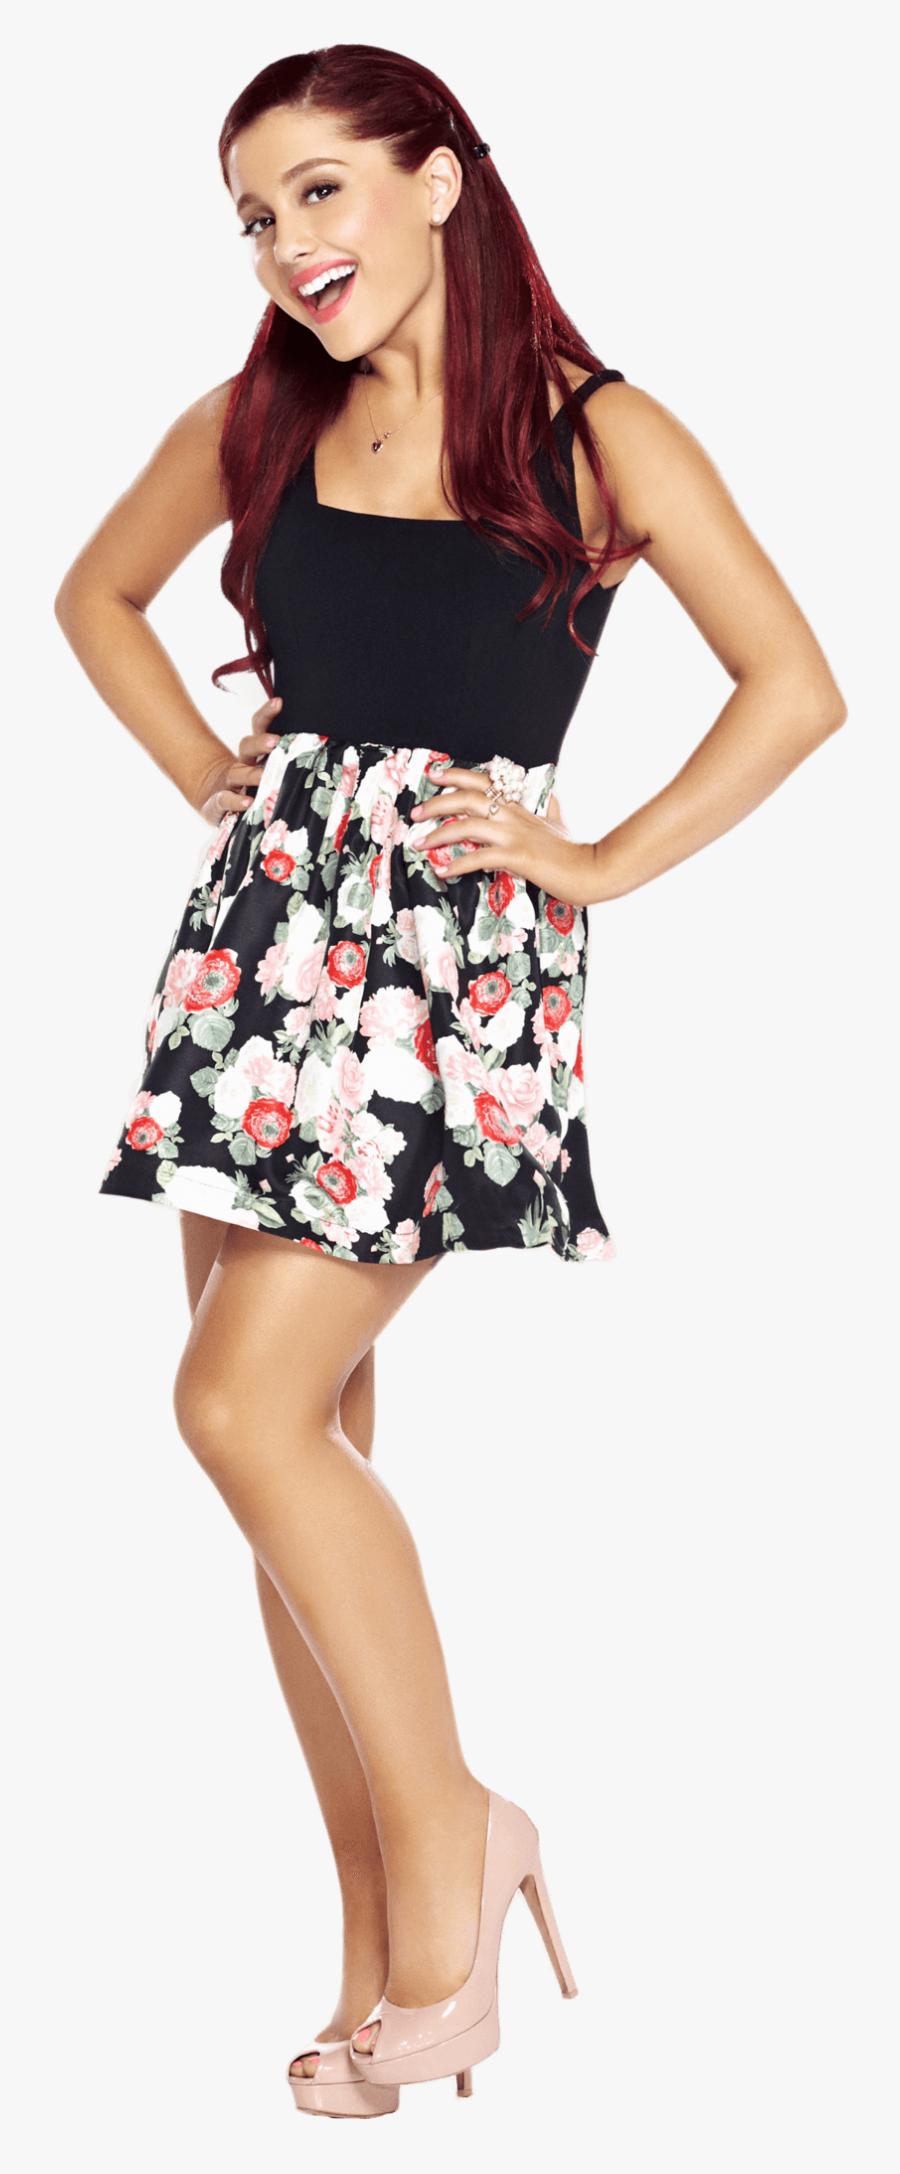 Ariana Grande Clipart Foot - Ariana Grande Fond Transparent, Transparent Clipart